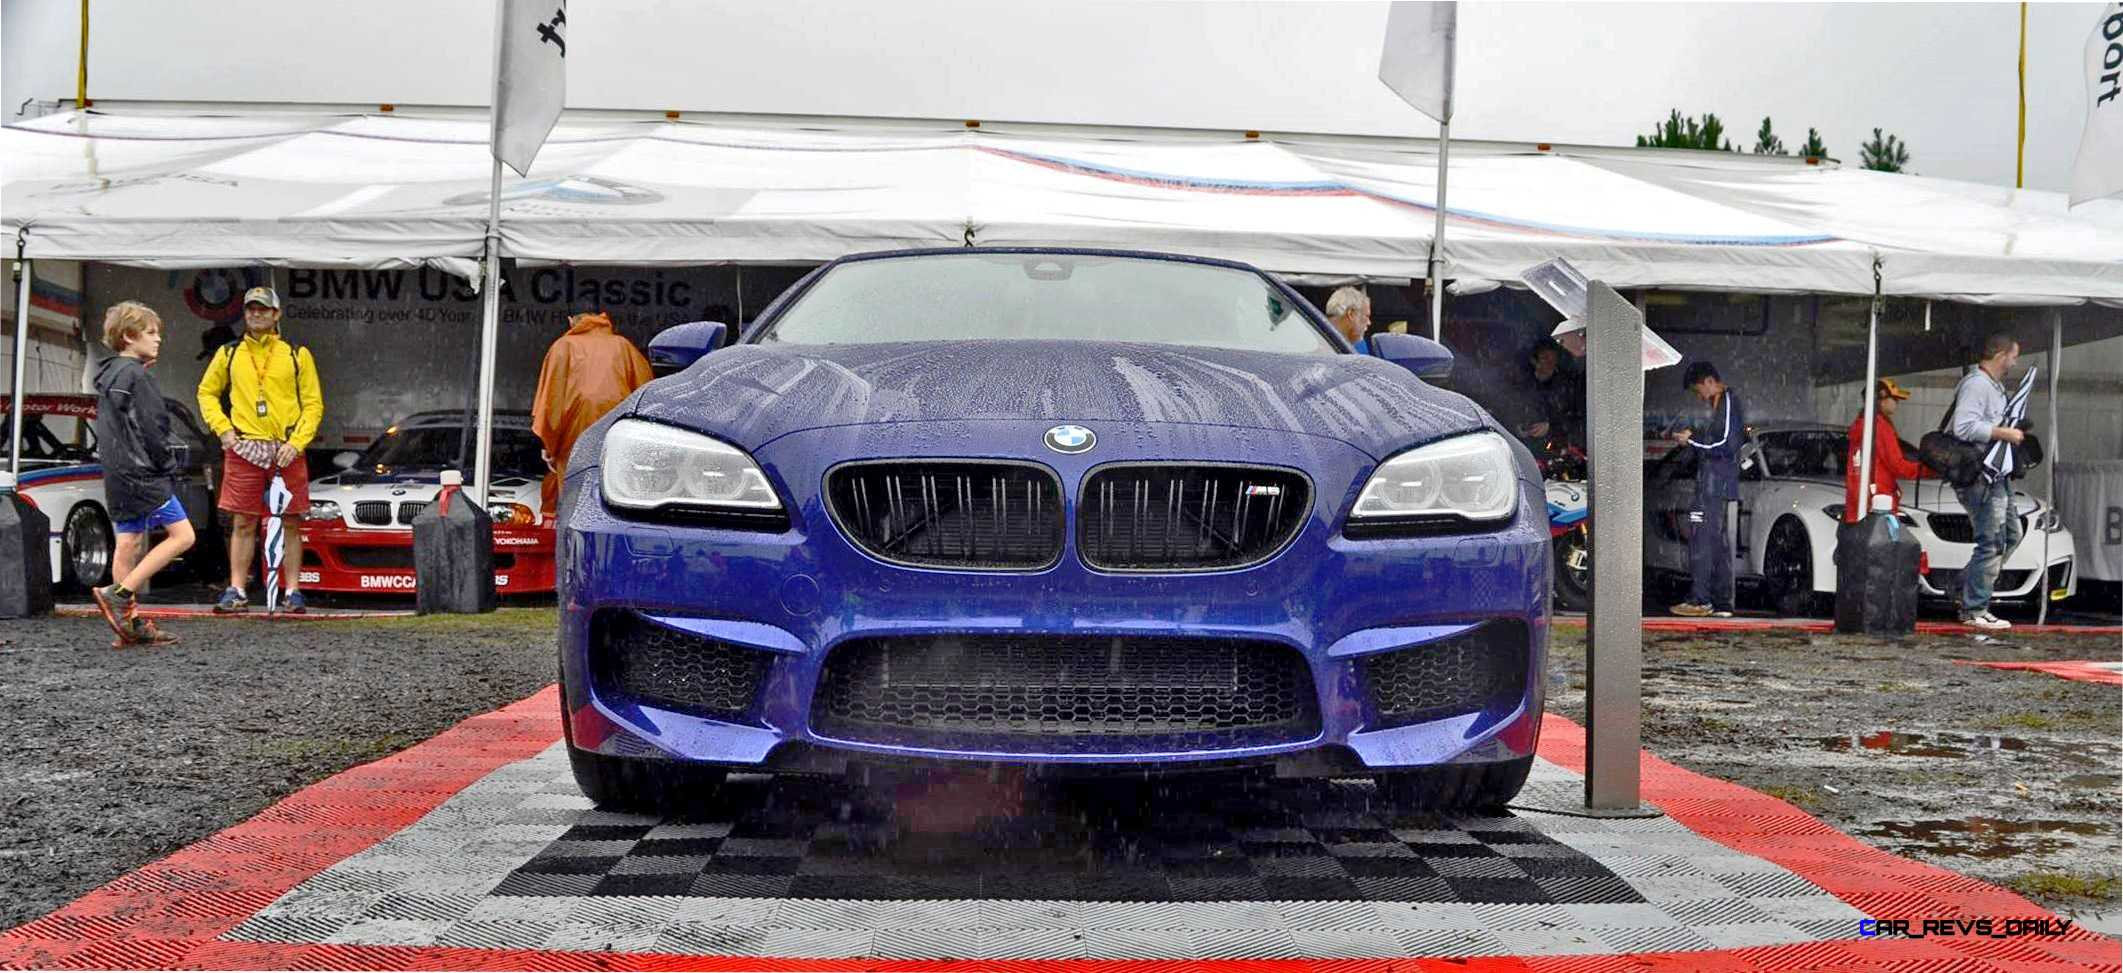 Animated Builder U2013 2016 BMW M6 Convertible U2013 San Merino Blue W/ Forged  Black M Double Spokes